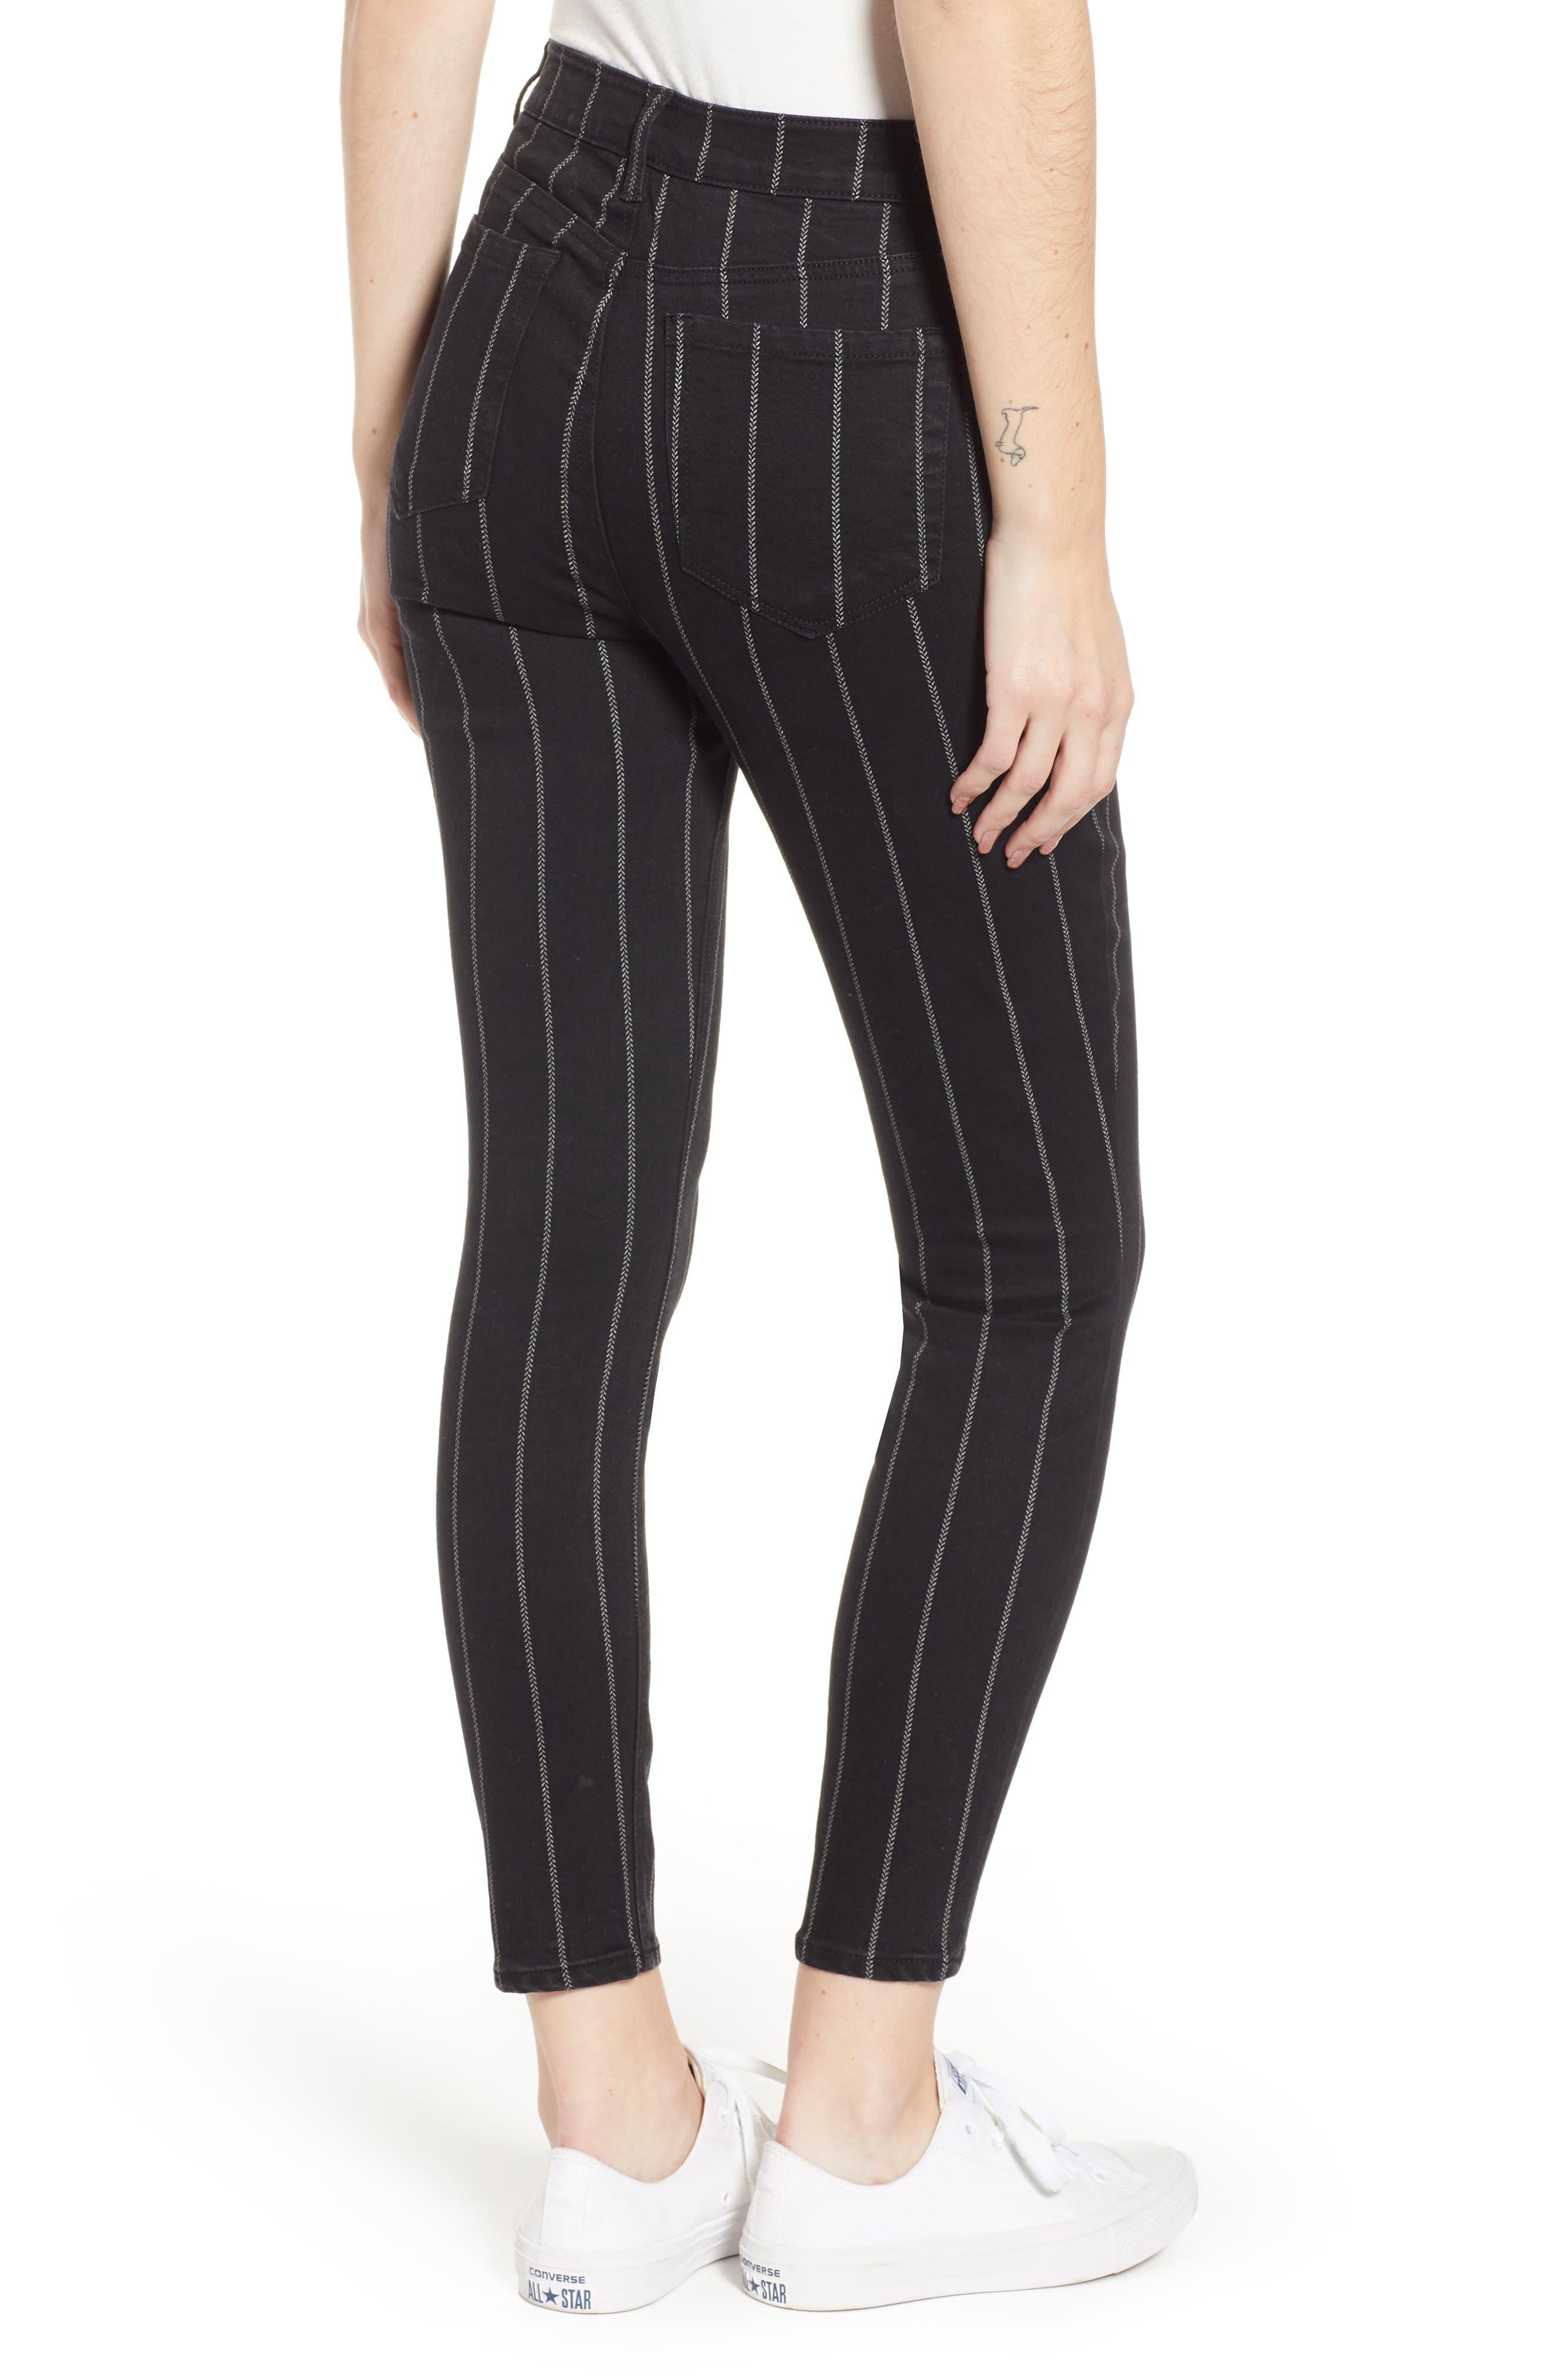 TINSEL, Stripe High Rise Skinny Jeans, Alternate thumbnail 2, color, 001